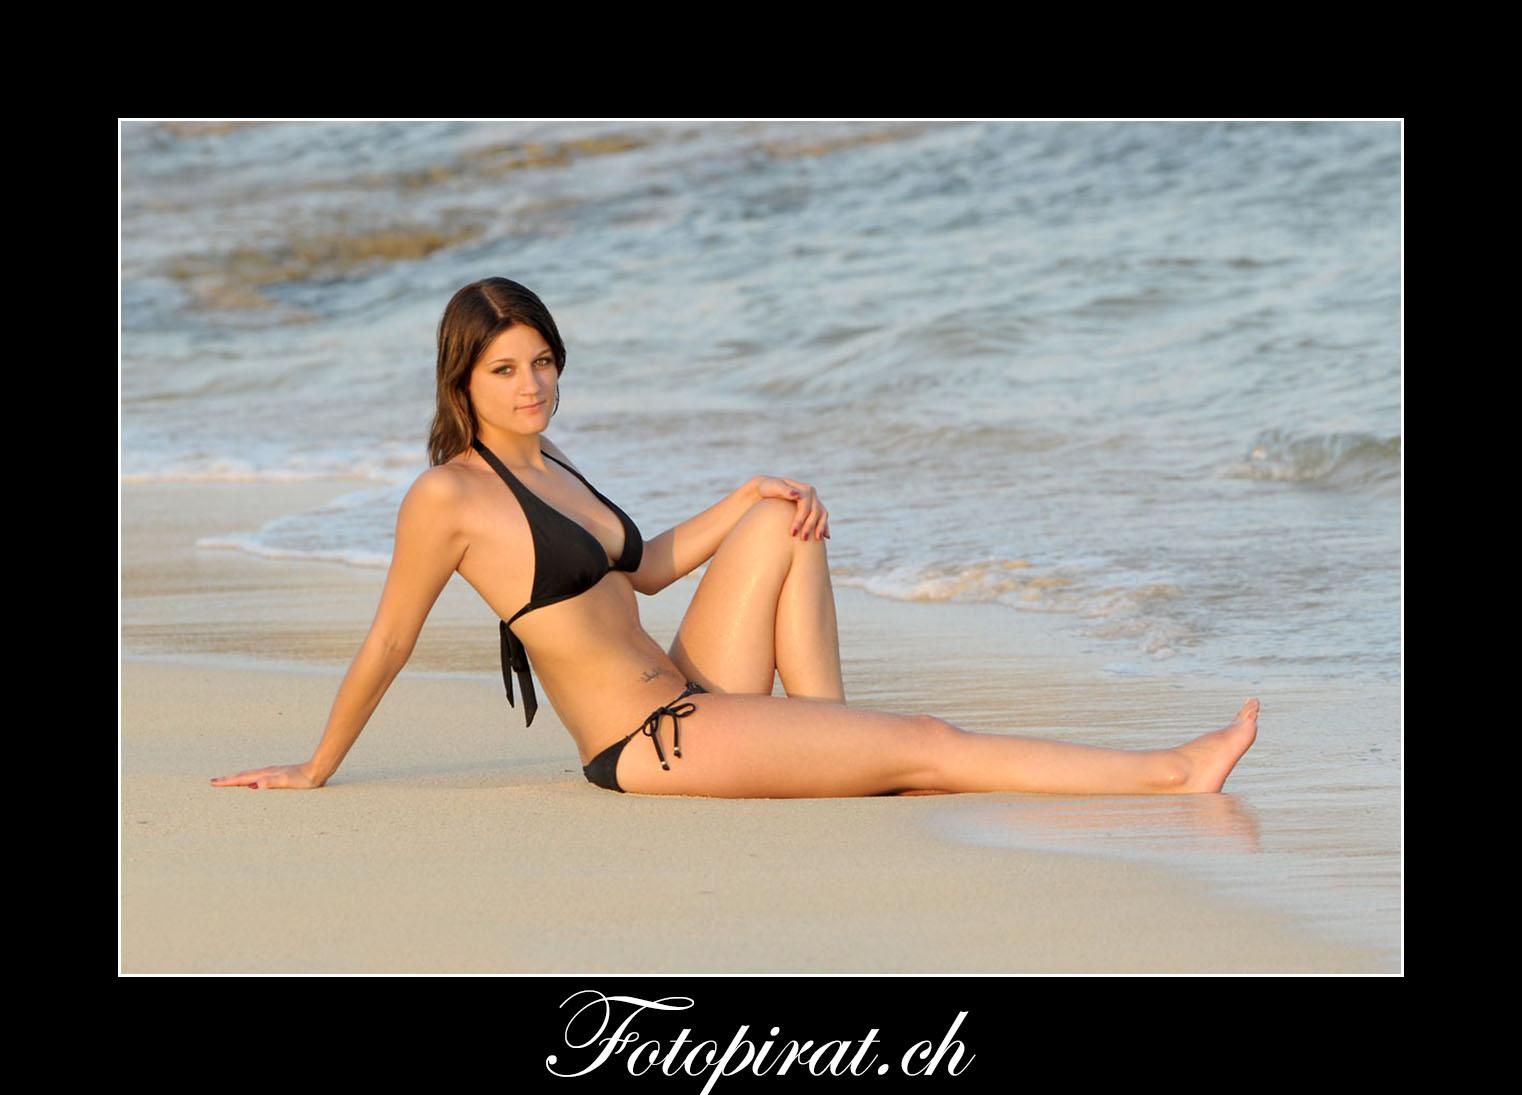 Fotoshooting, outdoor, Modelagentur, sexy Model, Sportmodel, Fitnessmodel, Beach, Bikini, Ayia Napa